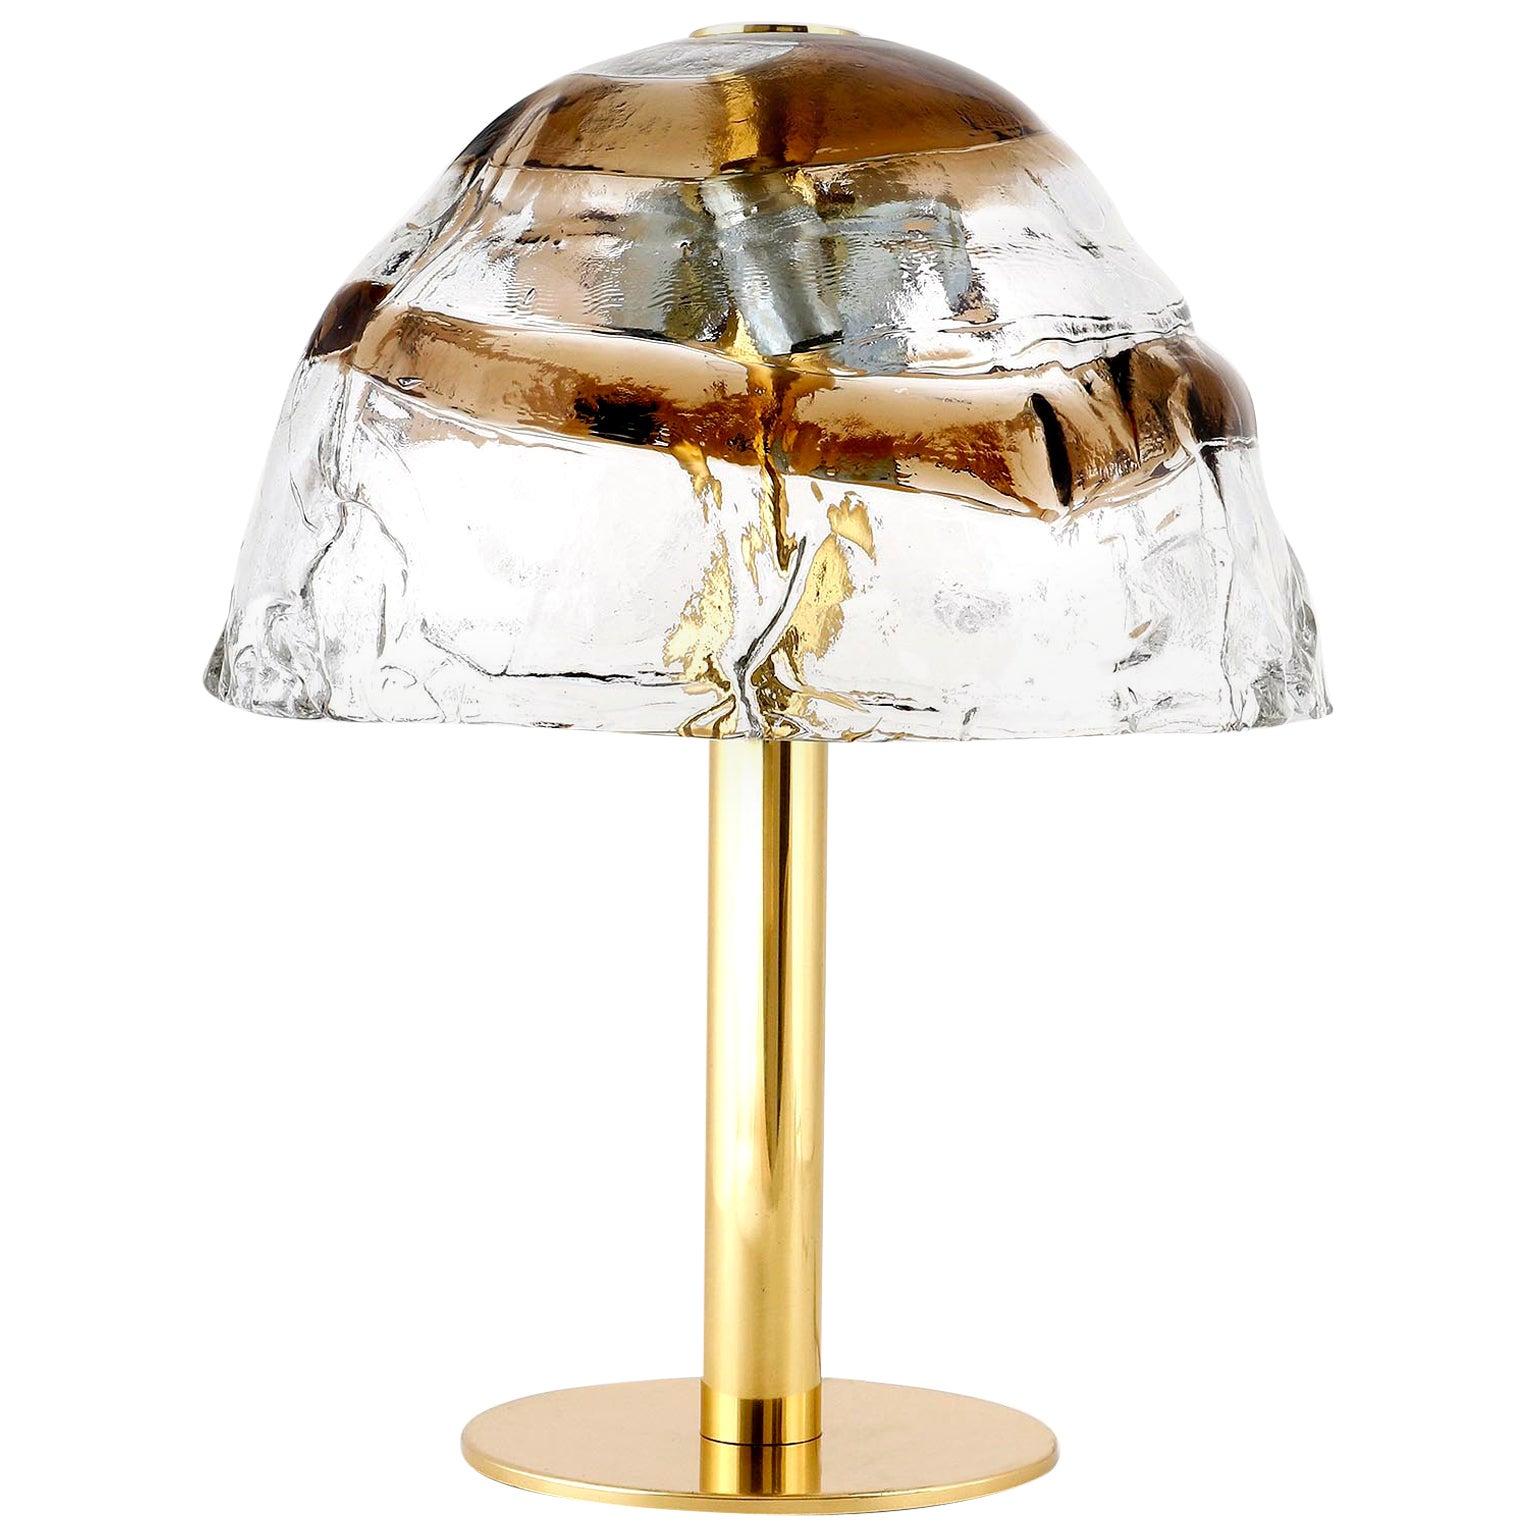 Kalmar Table Lamp 'Dom', Brass and Murano Glass, 1970